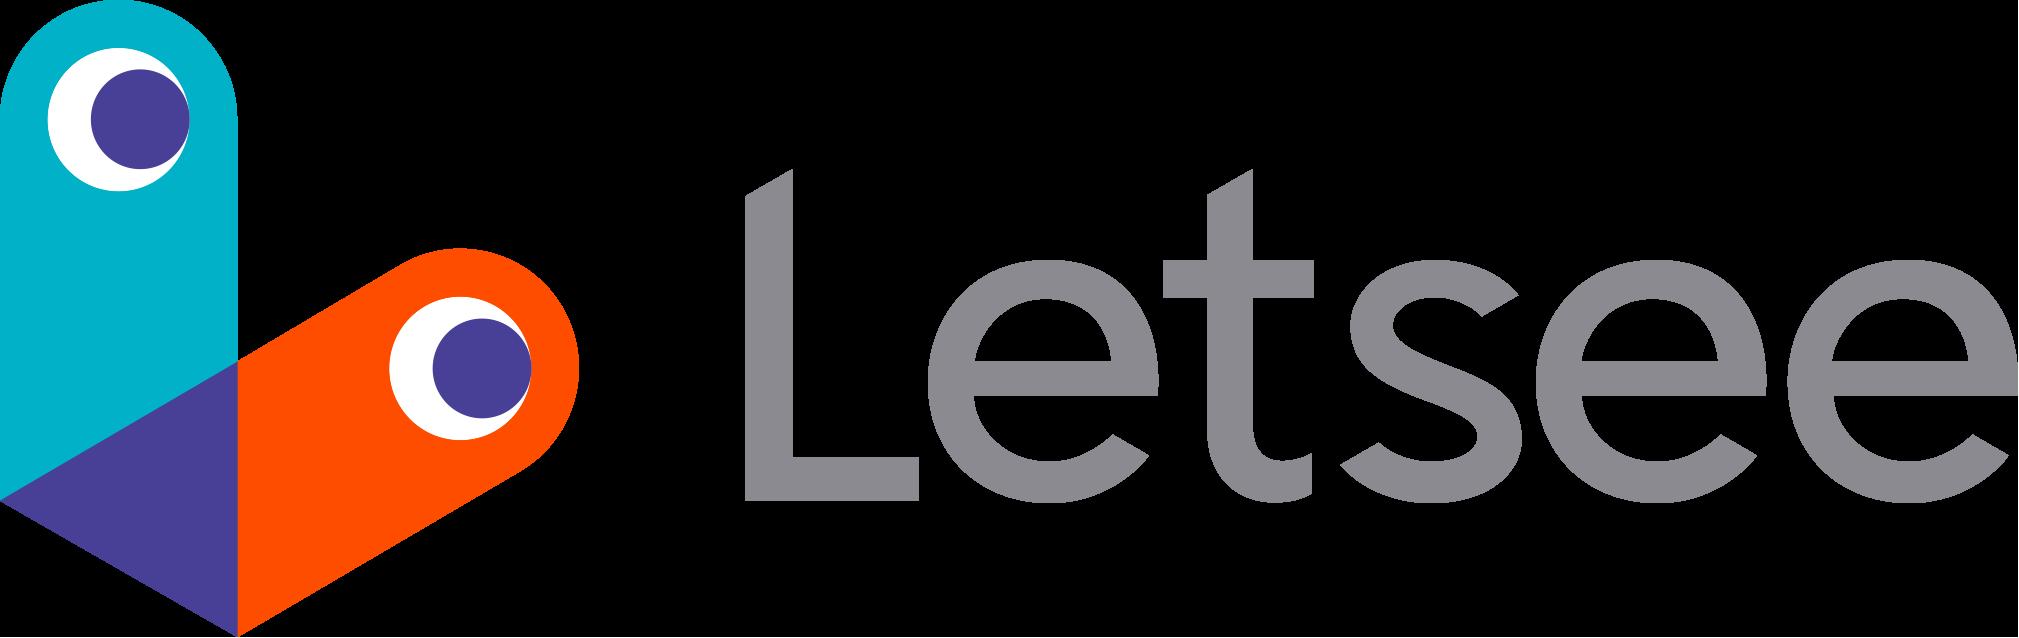 Letsee CI